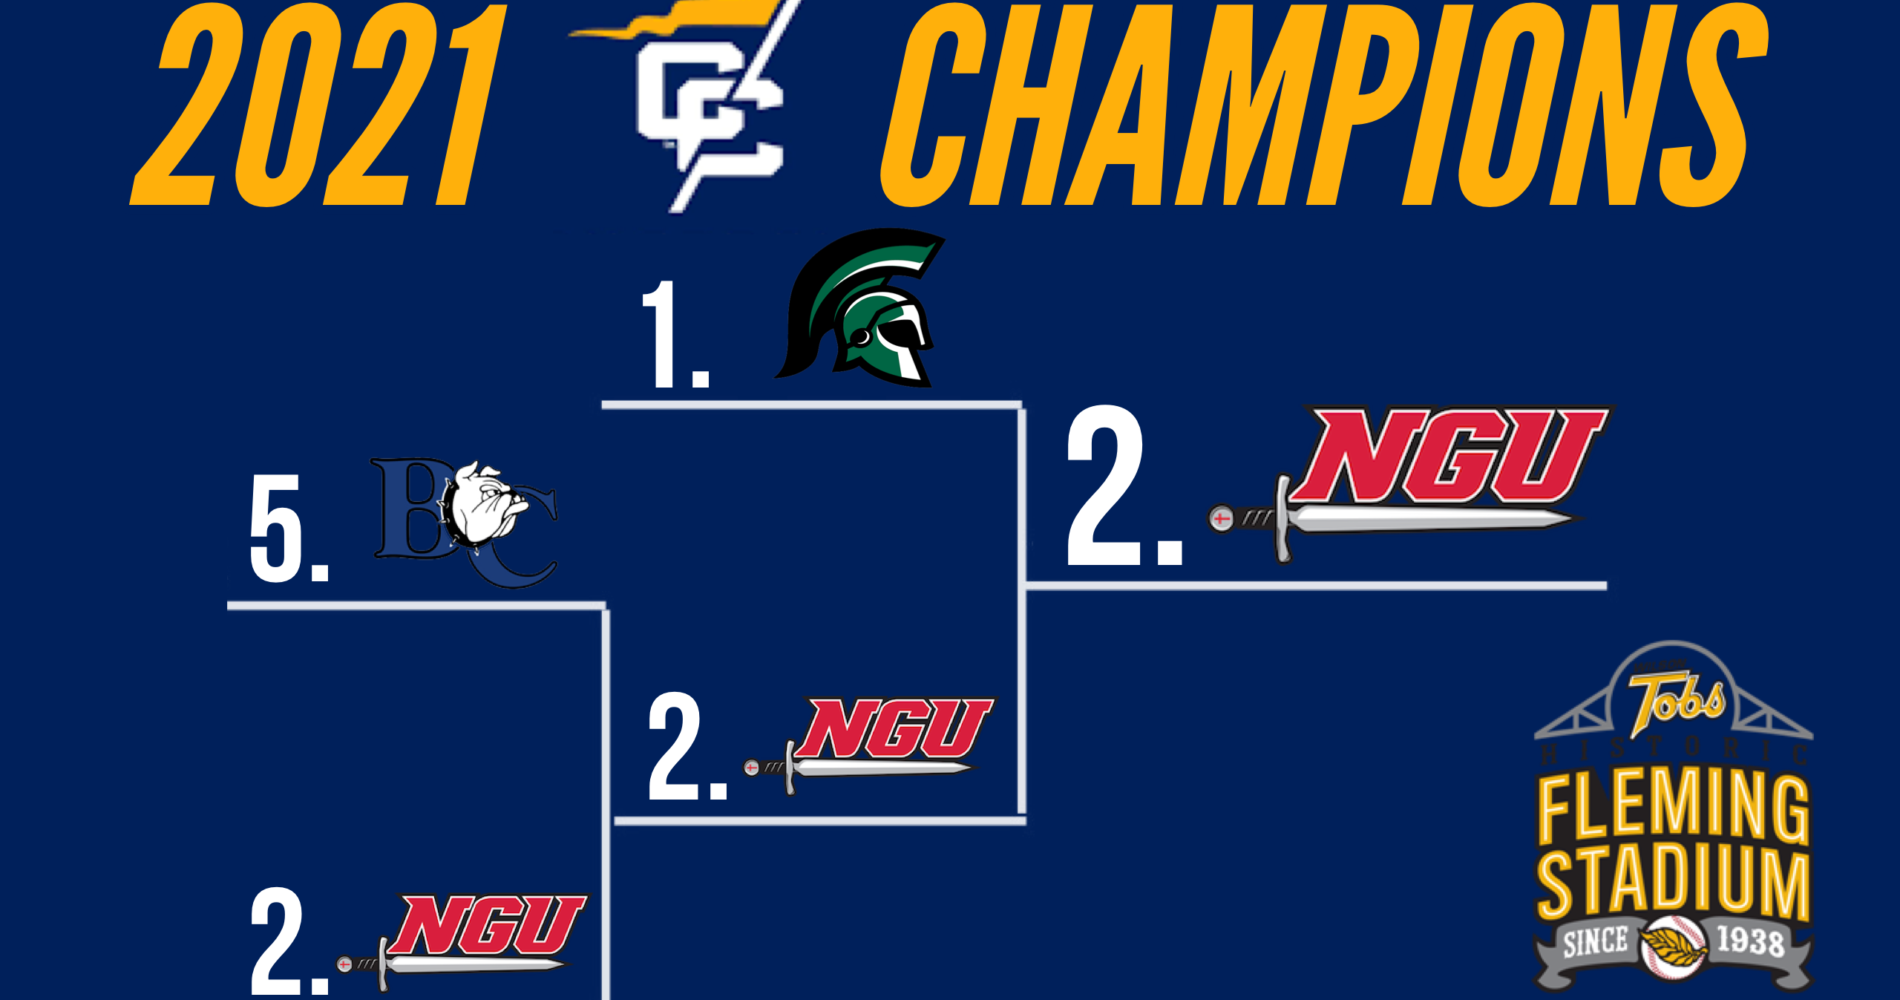 Congratulations to North Greenville University!